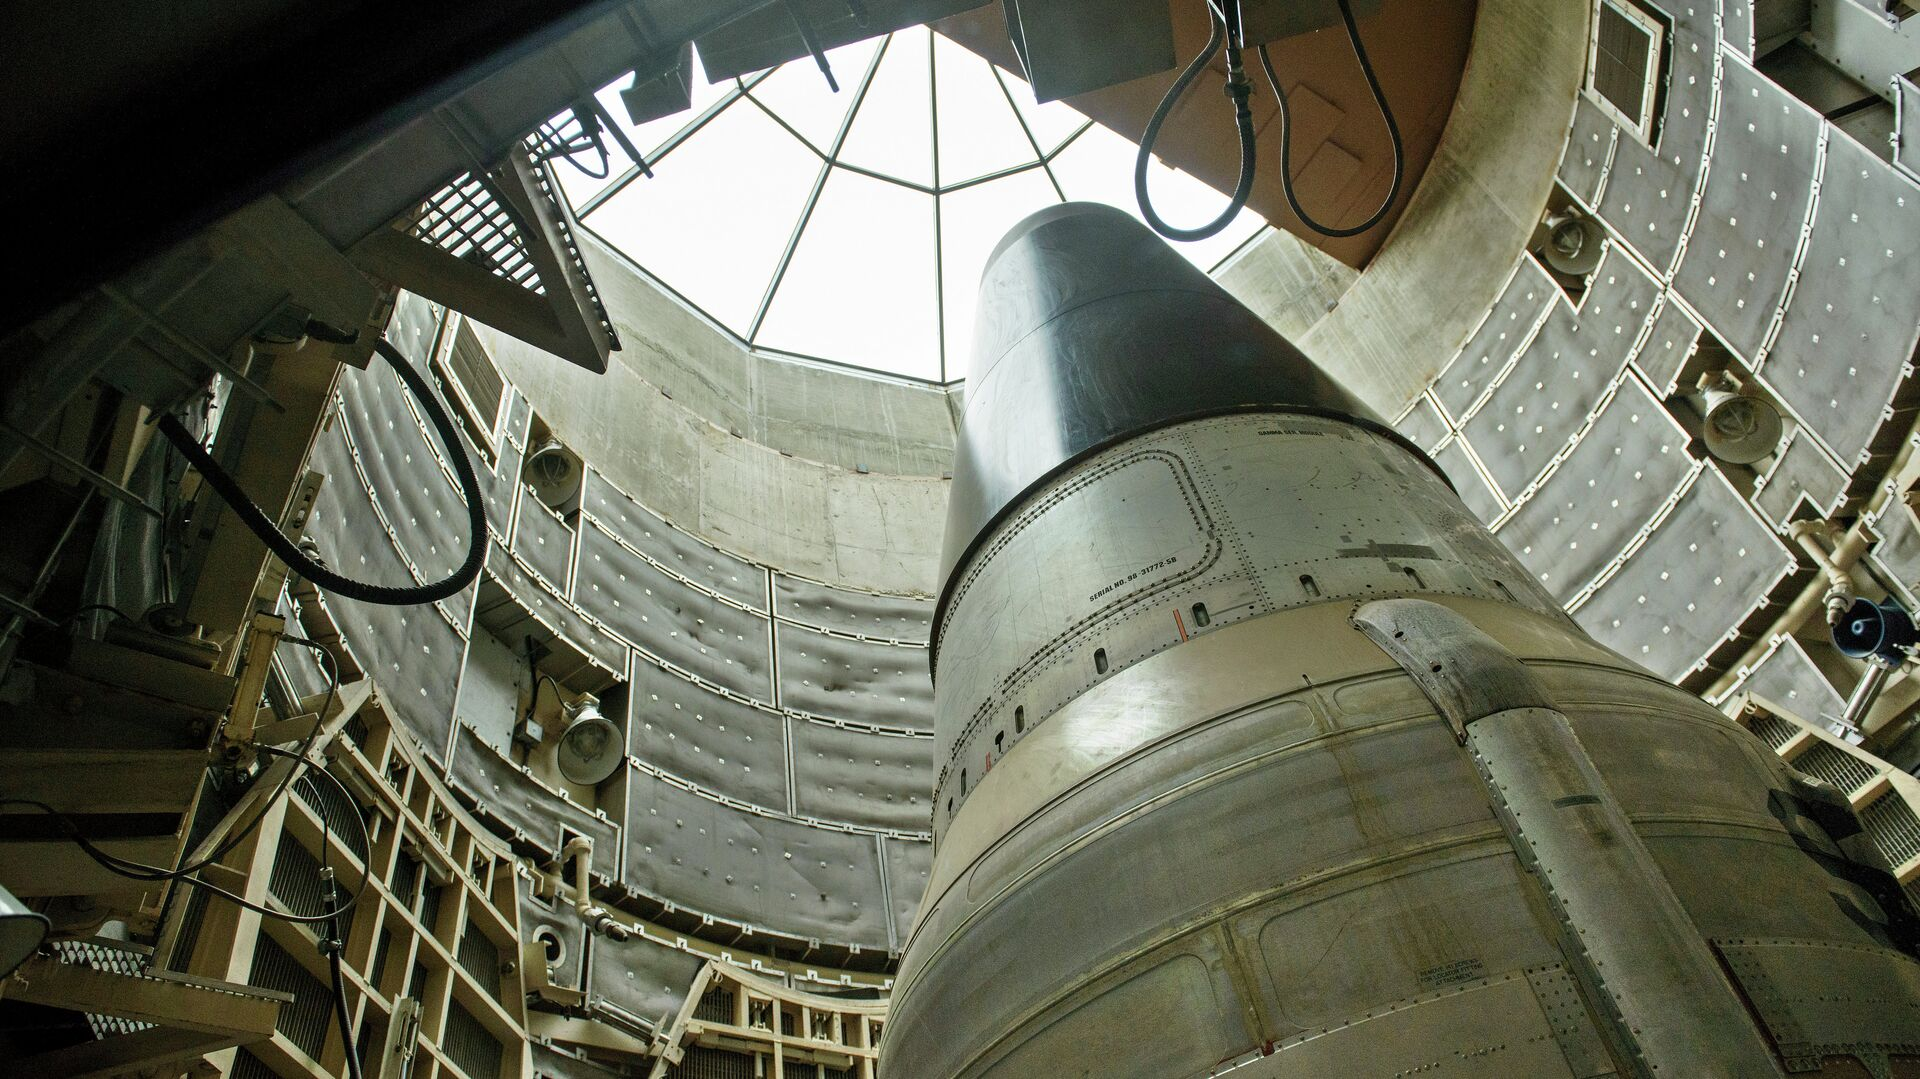 Misil nuclear estadounidense Titan II (archivo) - Sputnik Mundo, 1920, 20.05.2021